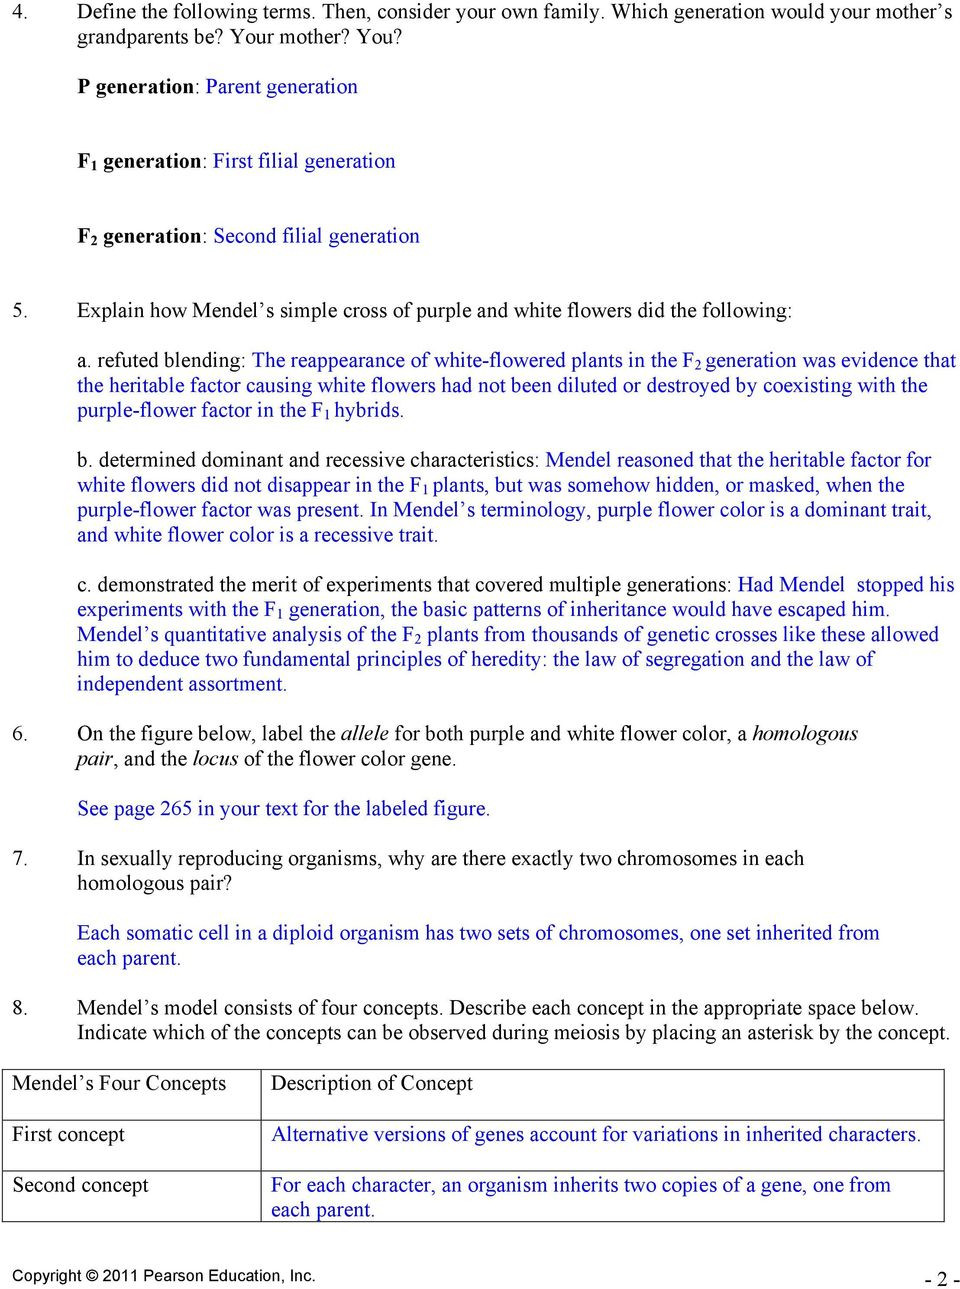 30 Mendelian Genetics Worksheet Answer Key | Education ...